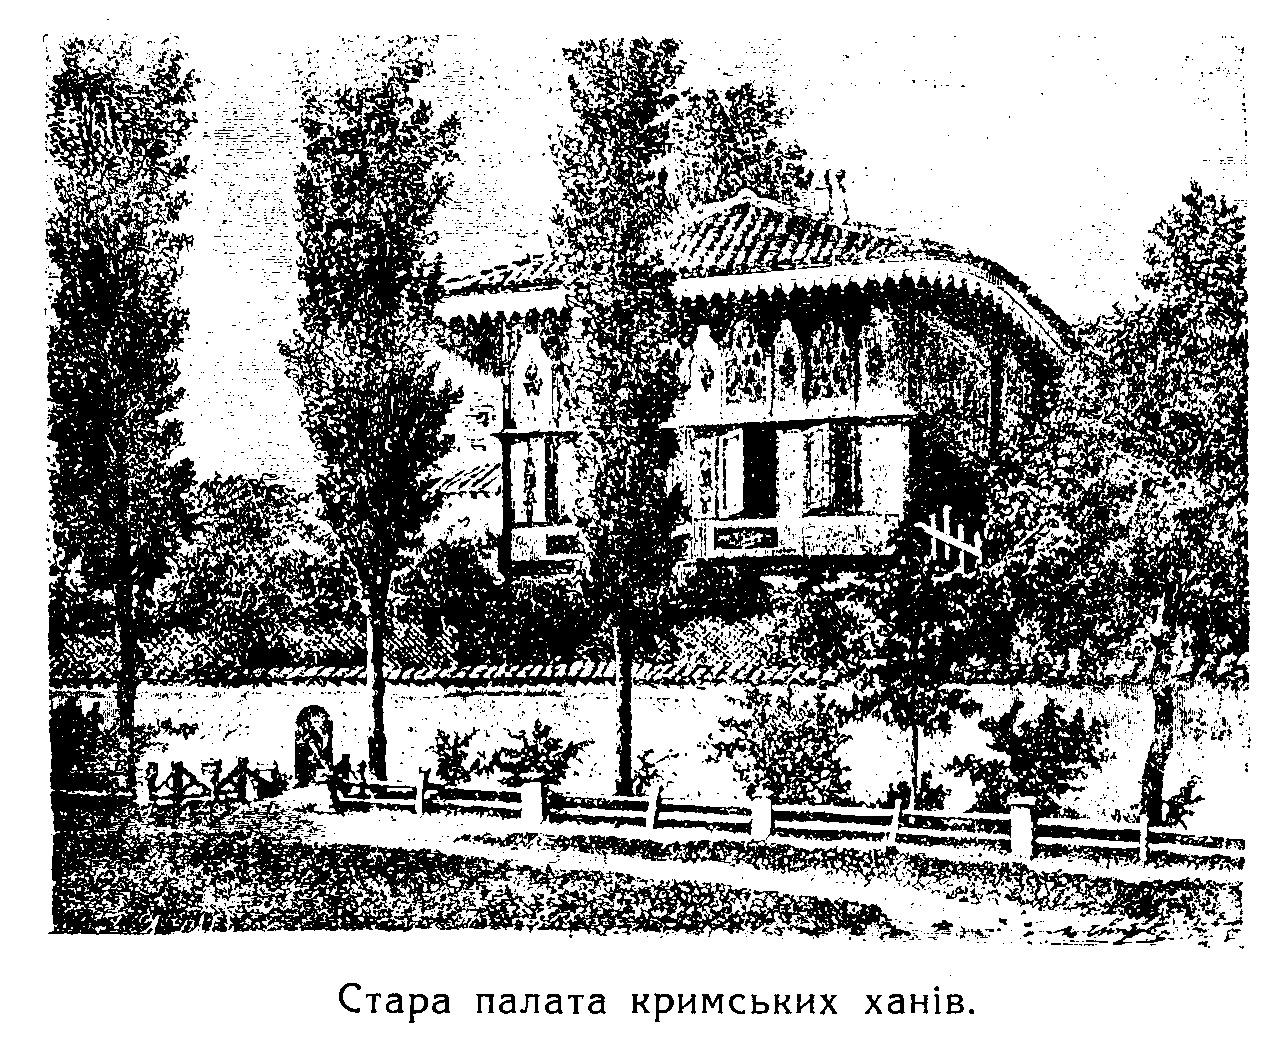 Стара палата кримських ханів